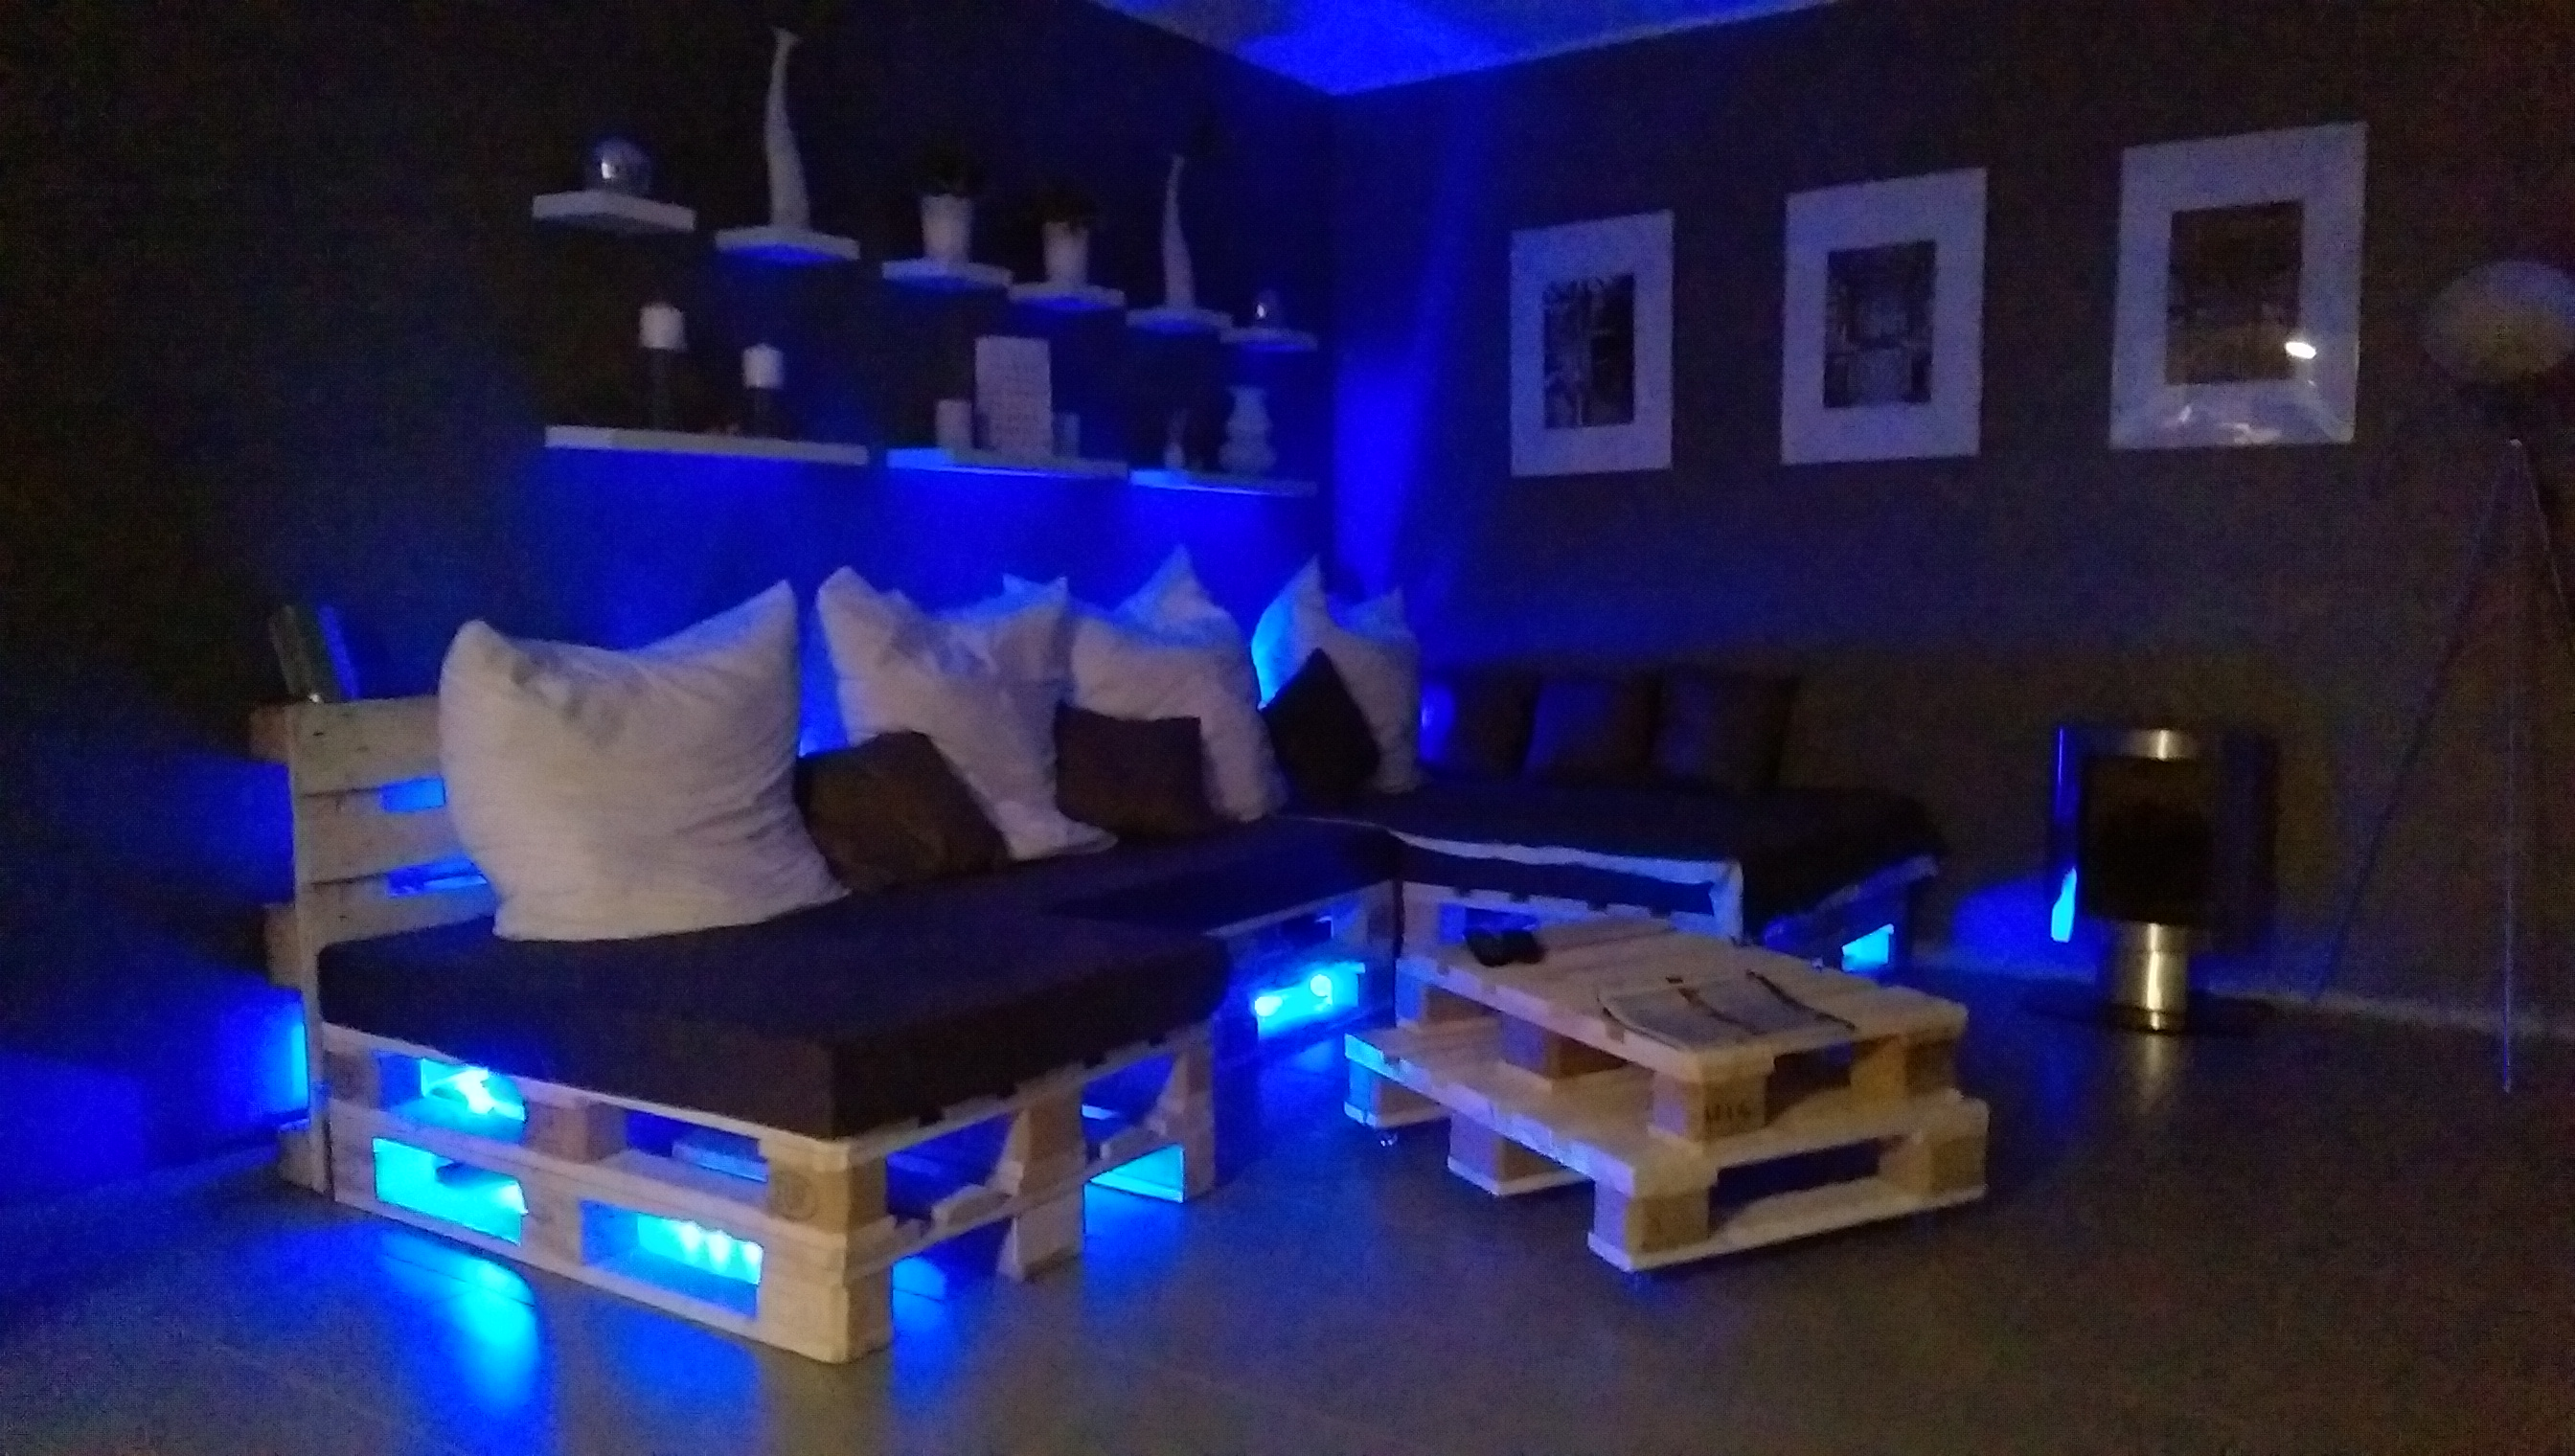 Lampu biru menghiasi perabot diy sofa pallet putih dan kusyen hitam